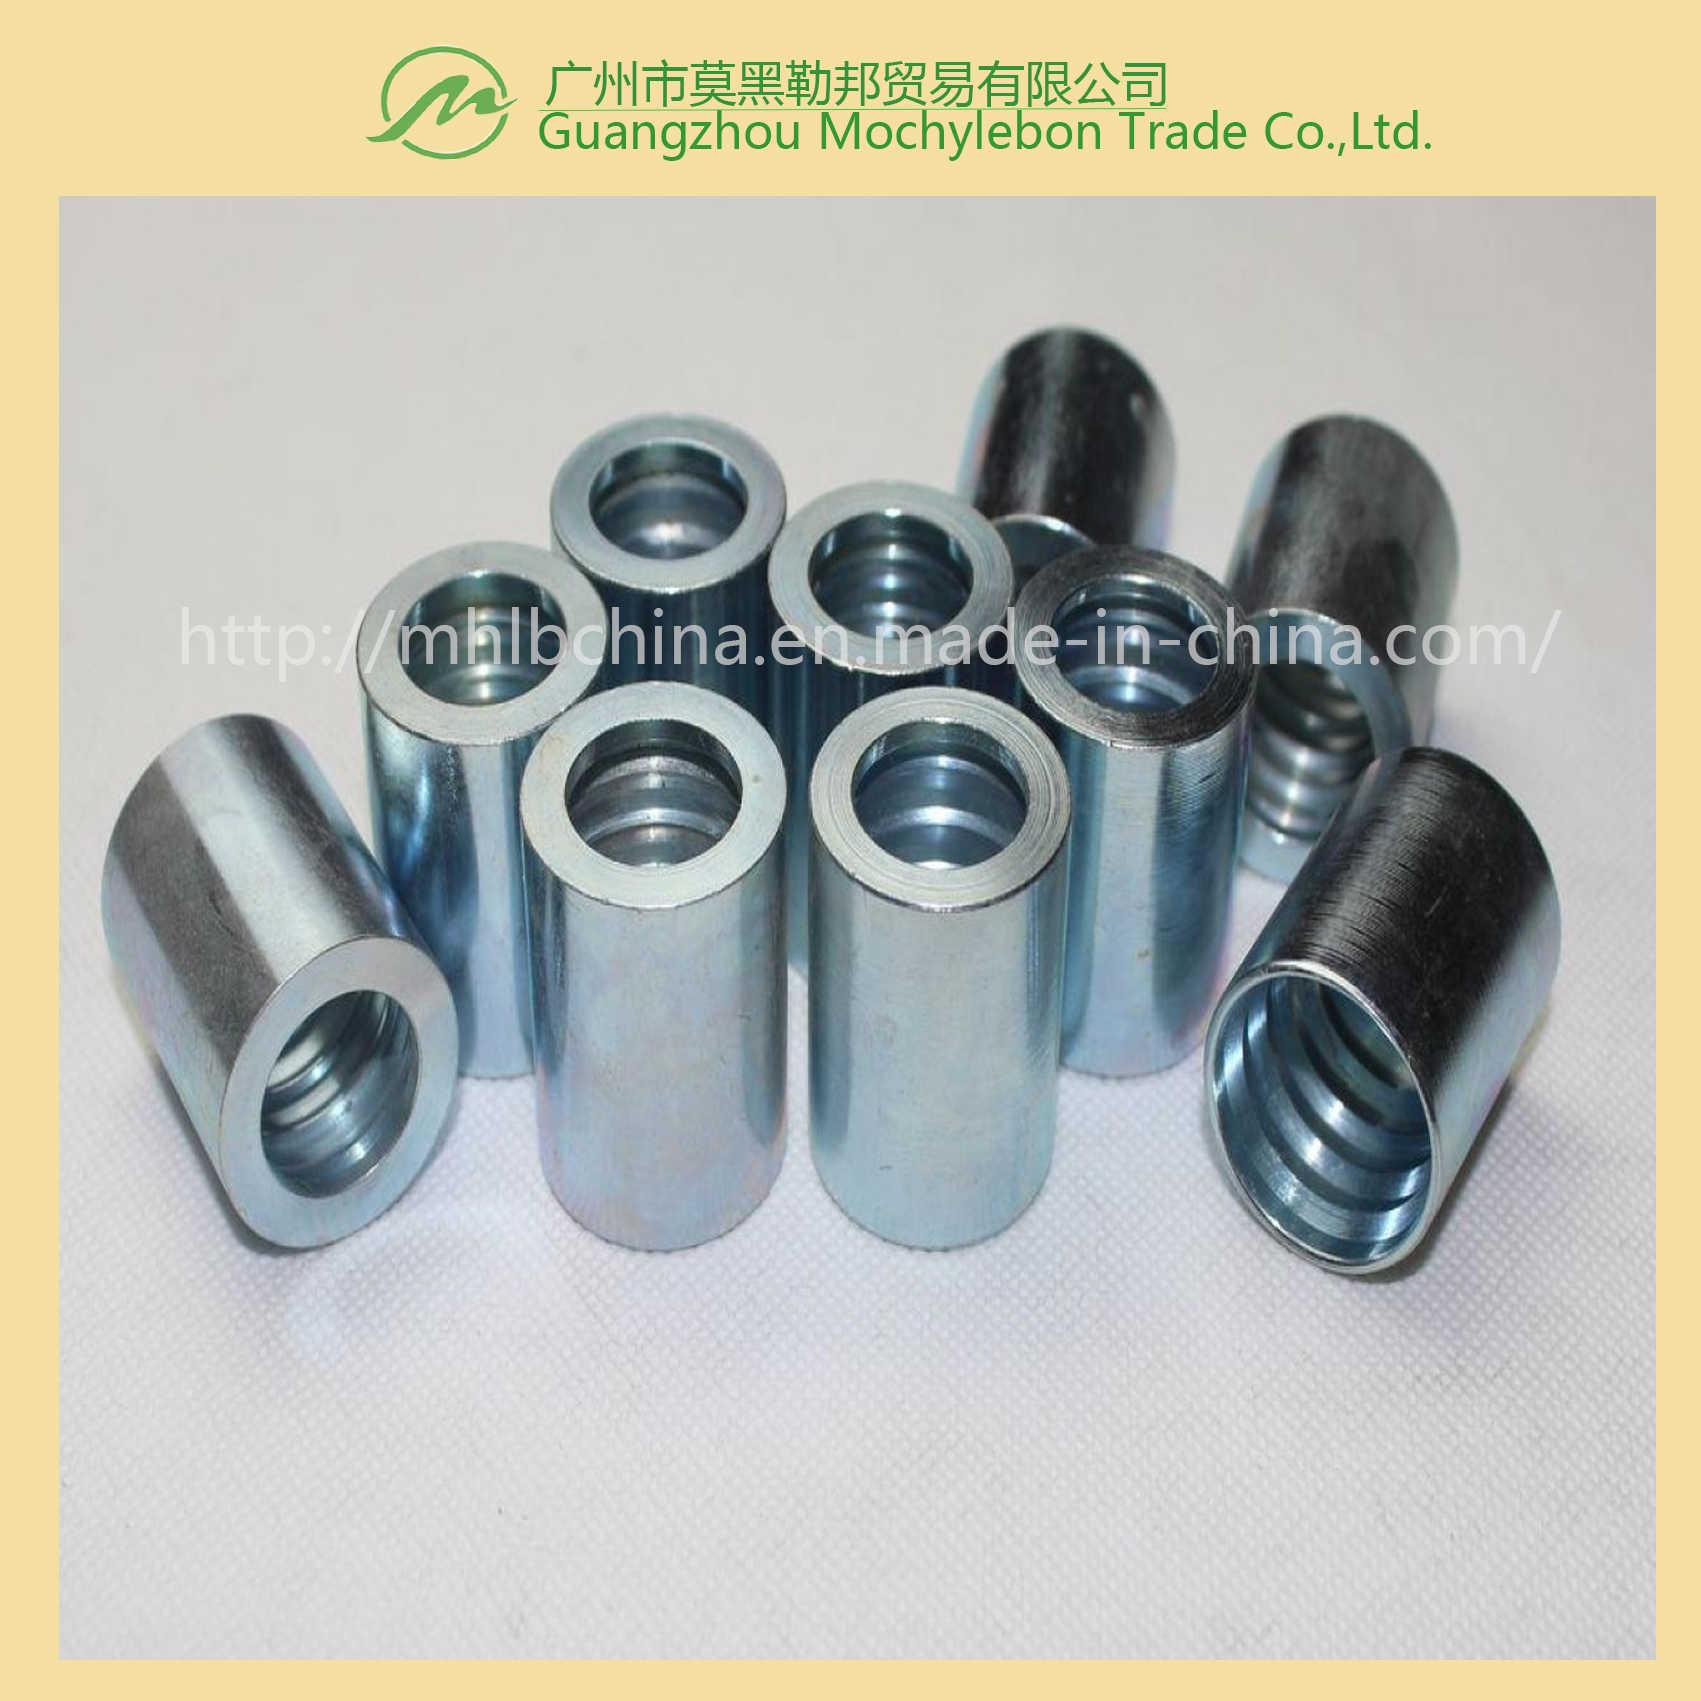 Hydraulic Fittings/Sleeves/Ferrules/Fittings for Hydraulic Hoses